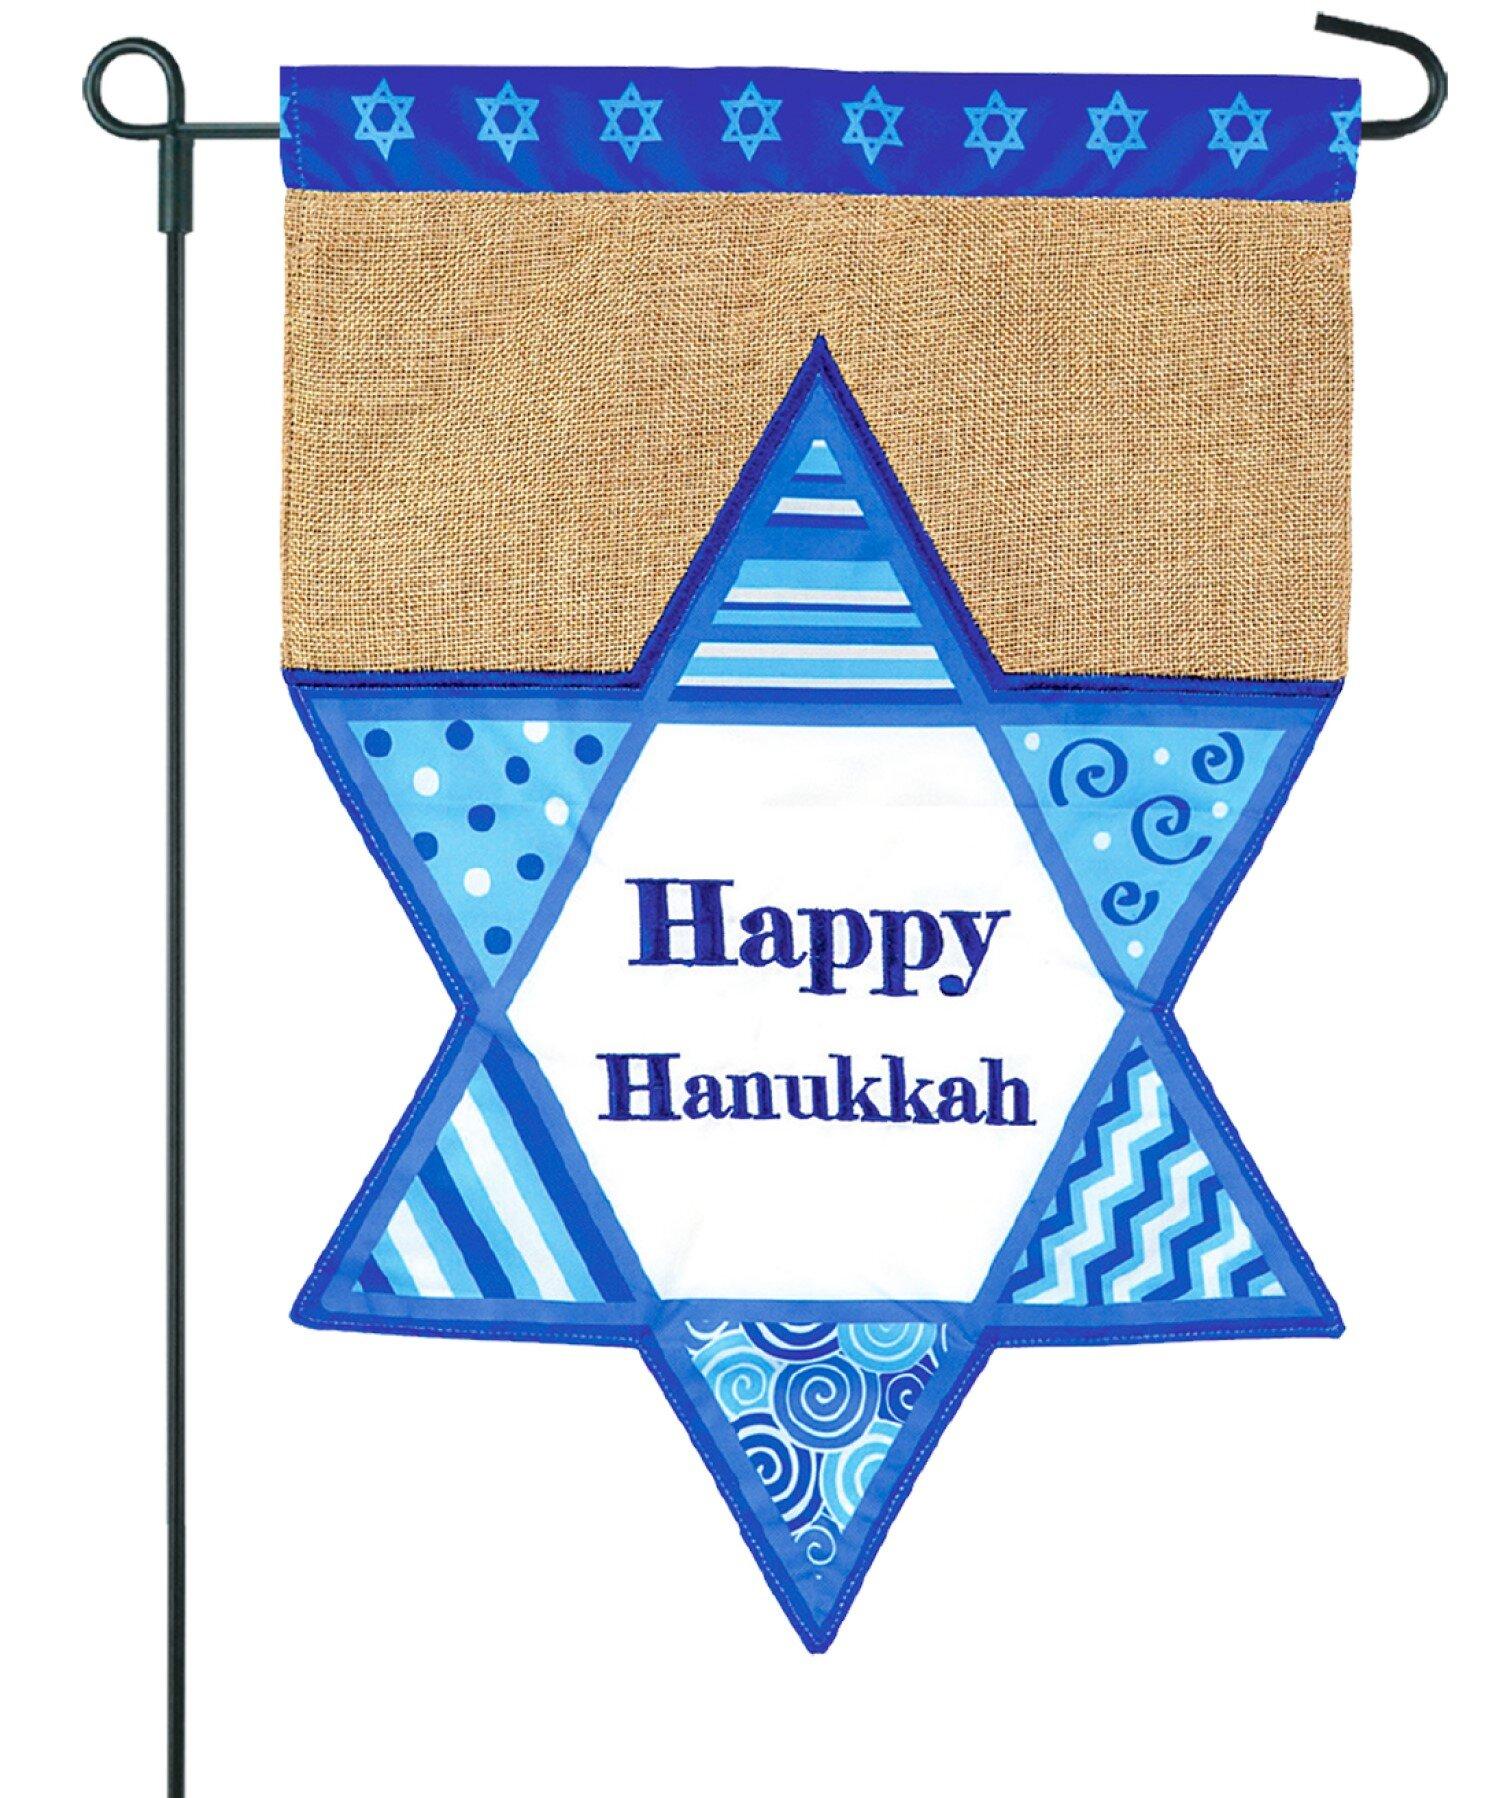 Jec Home Goods Happy Hanukkah 2 Sided Burlap 18 X 13 In Garden Flag Reviews Wayfair